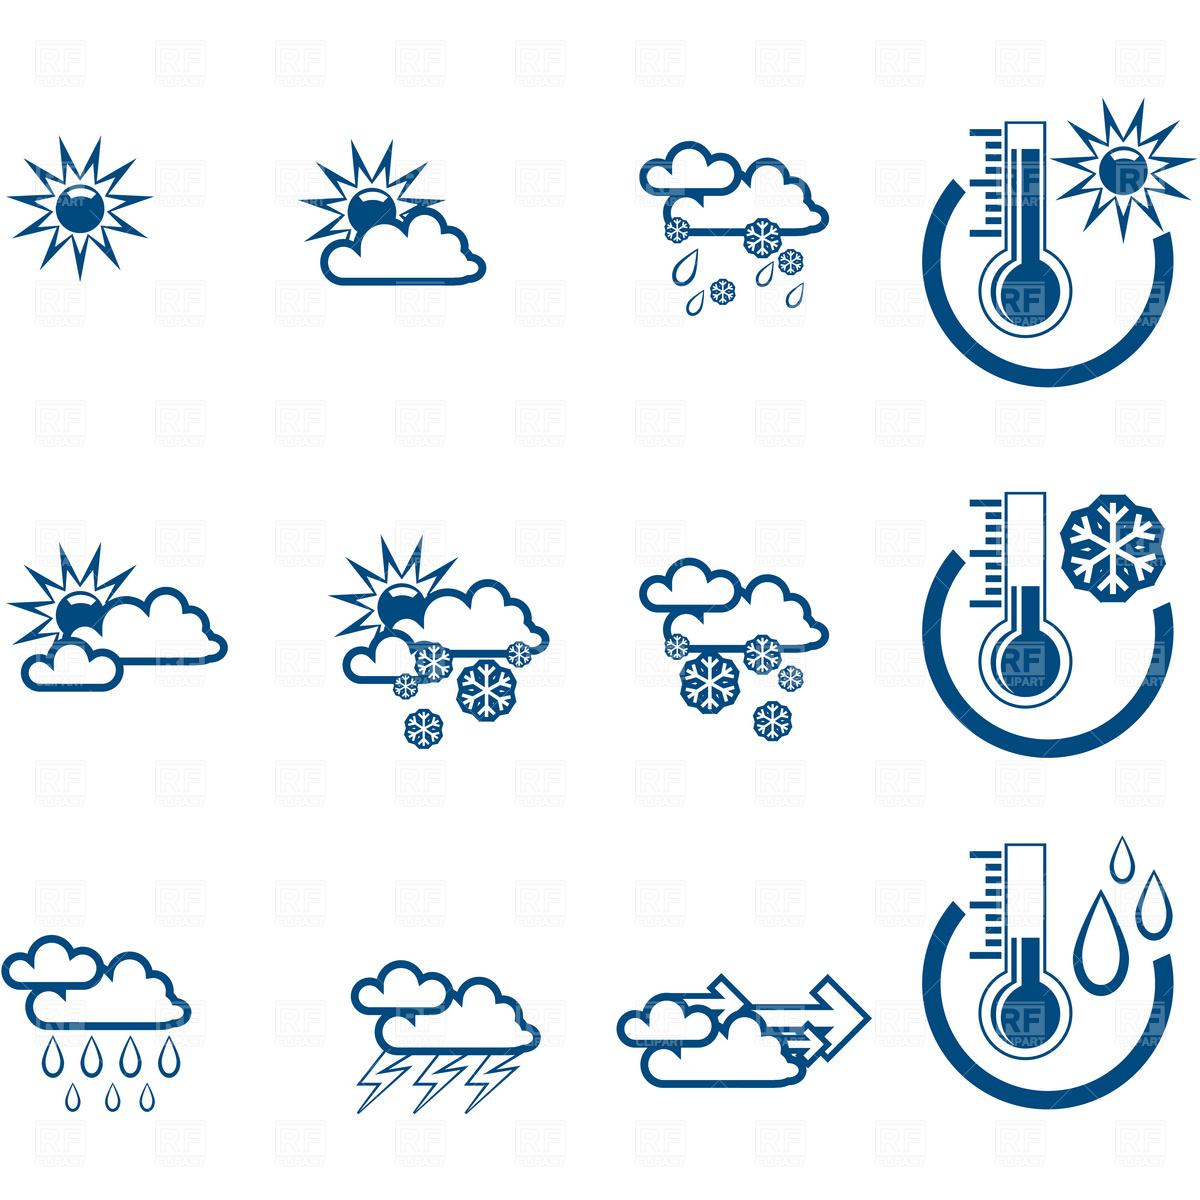 Forecast Clip Art   Clipart Panda - Free Clipart Images  Forecast Clip A...